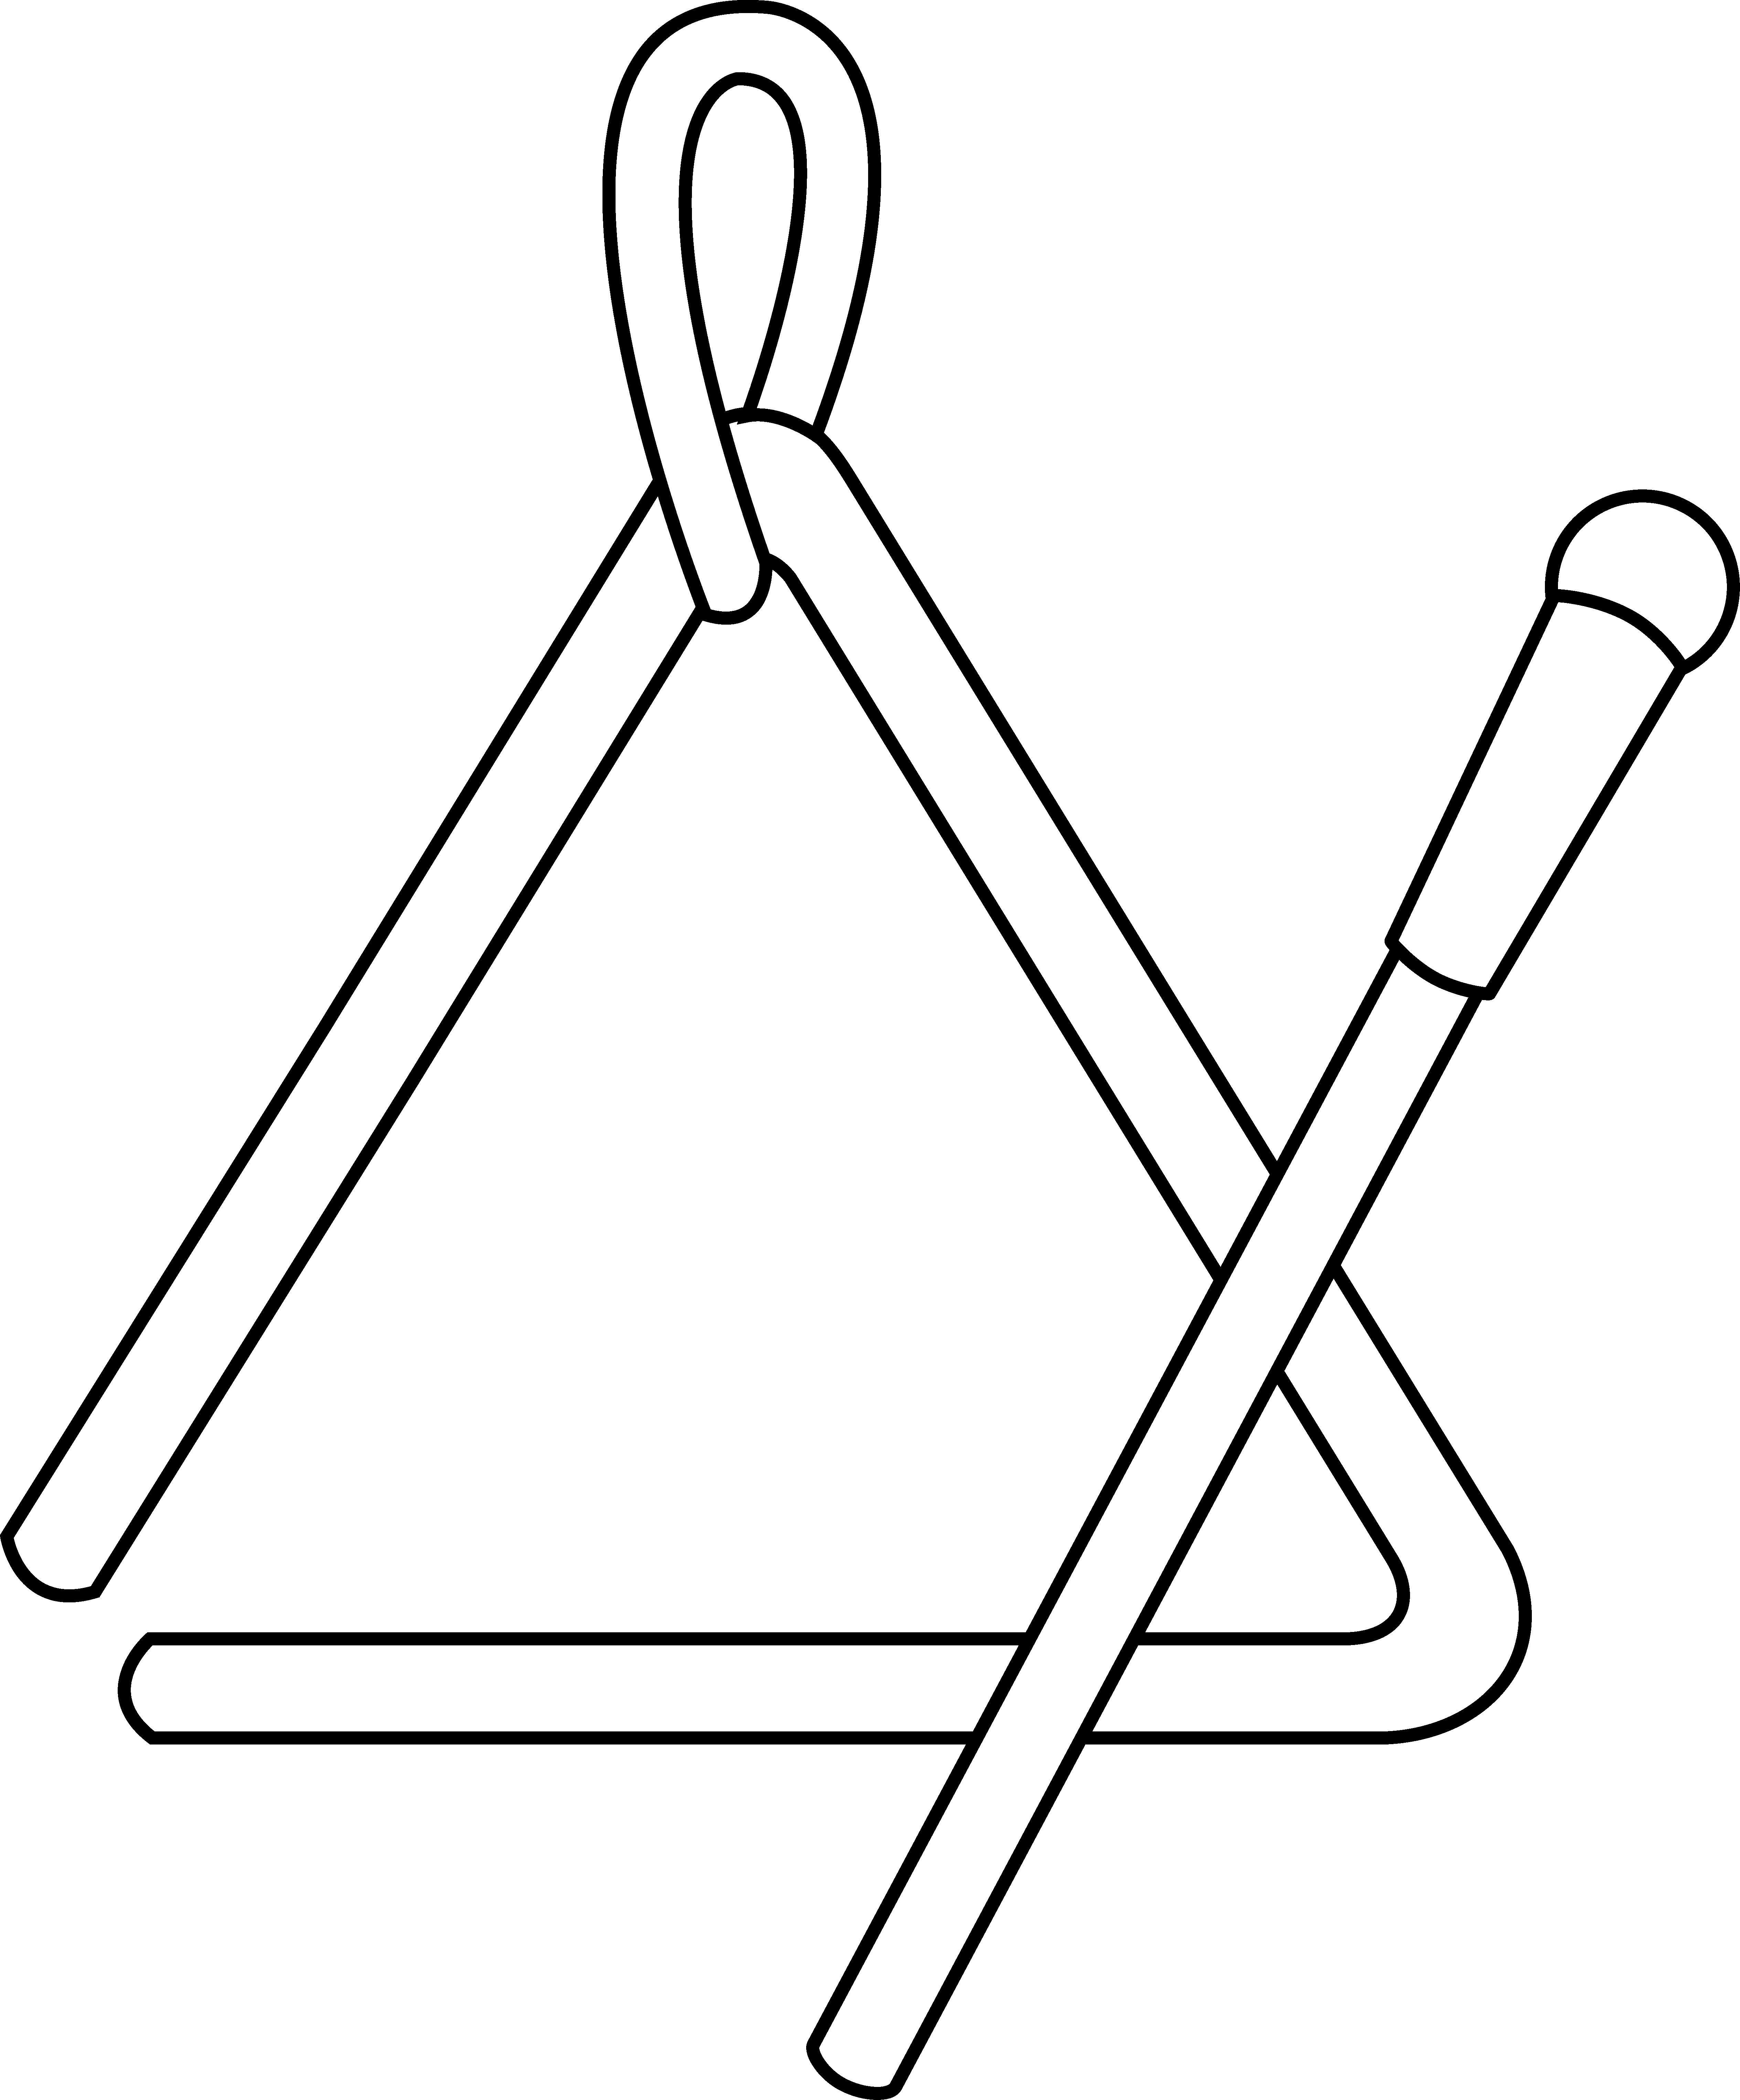 Percussion instrument clipart #9